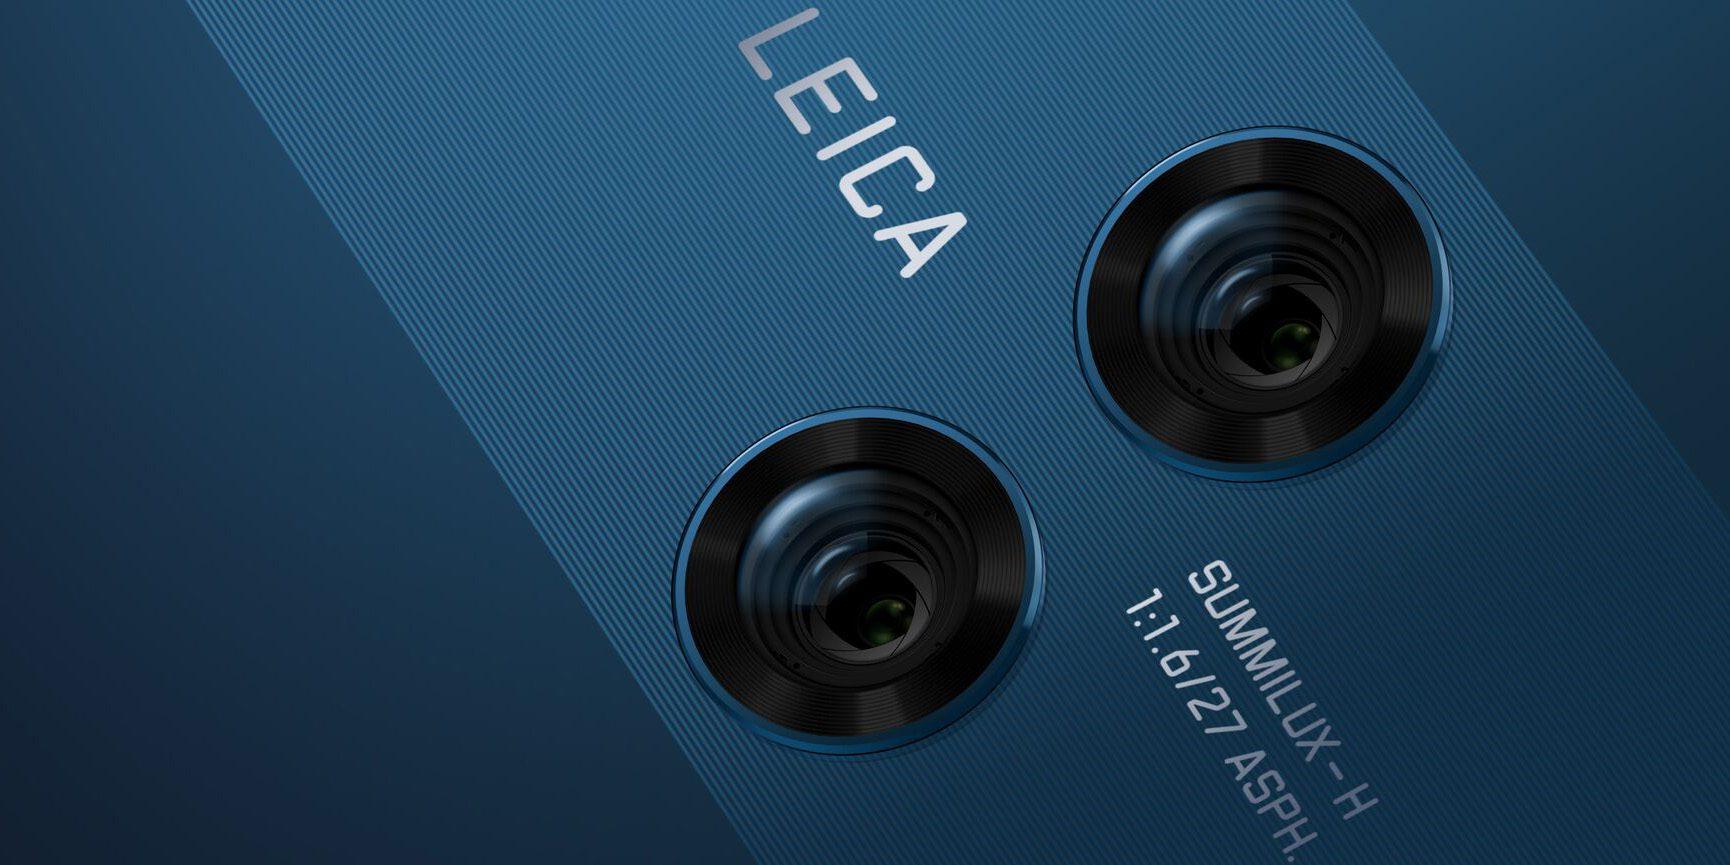 Huawei Mate 10 Pro fotocamere posteriori LEICA